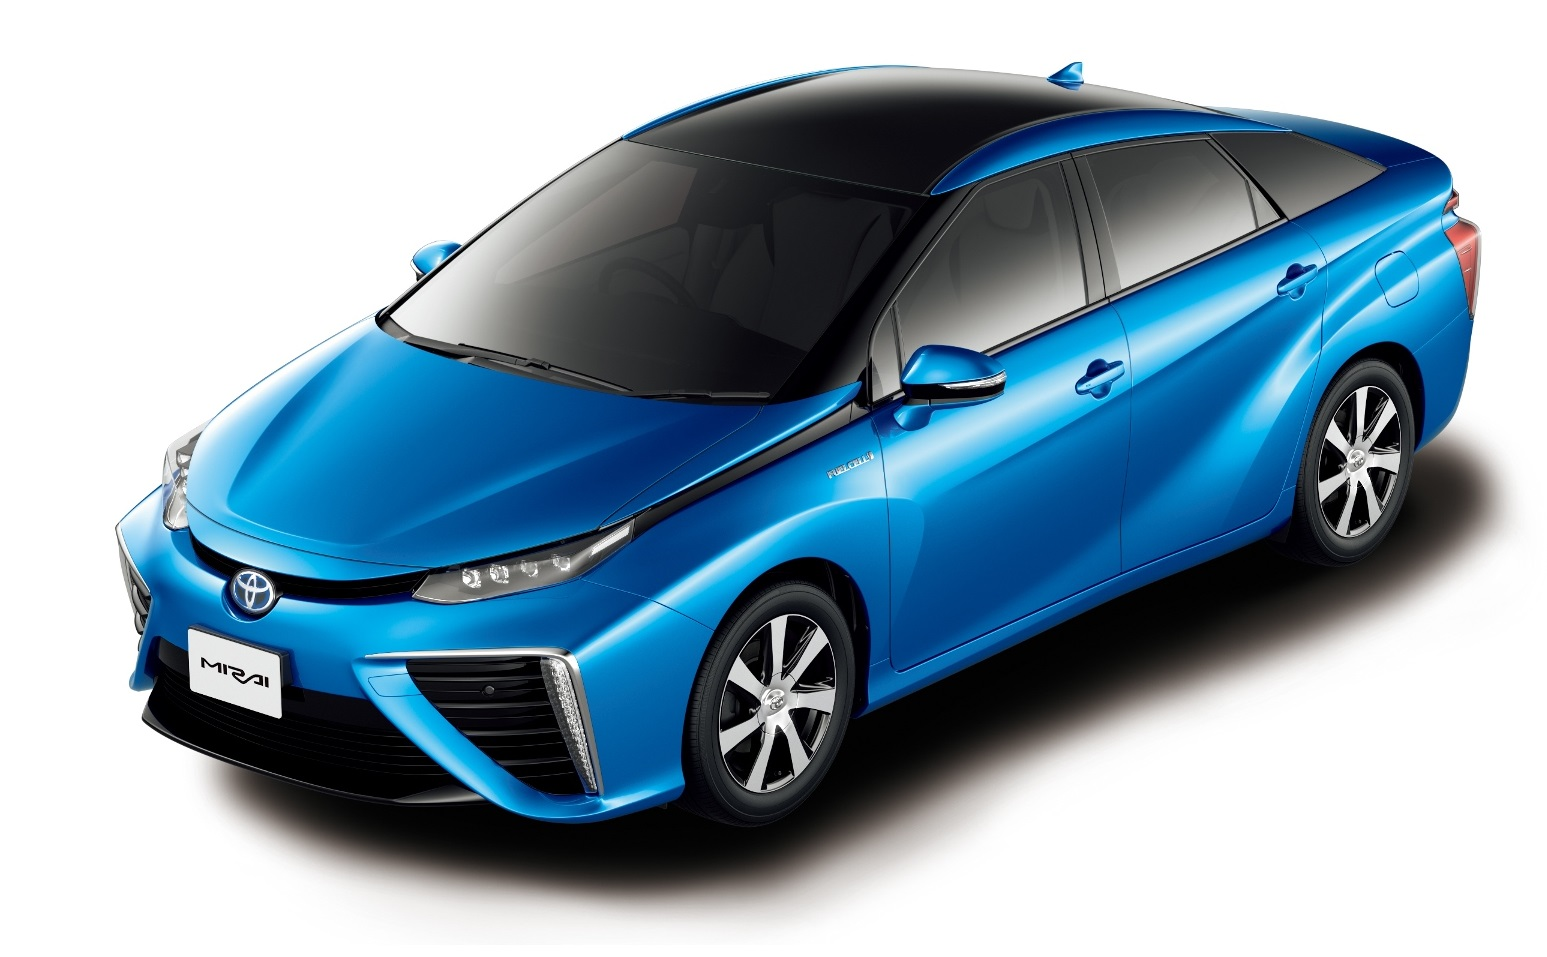 Toyota-Mirai-Fuel-Cell-Hydrogen-Car